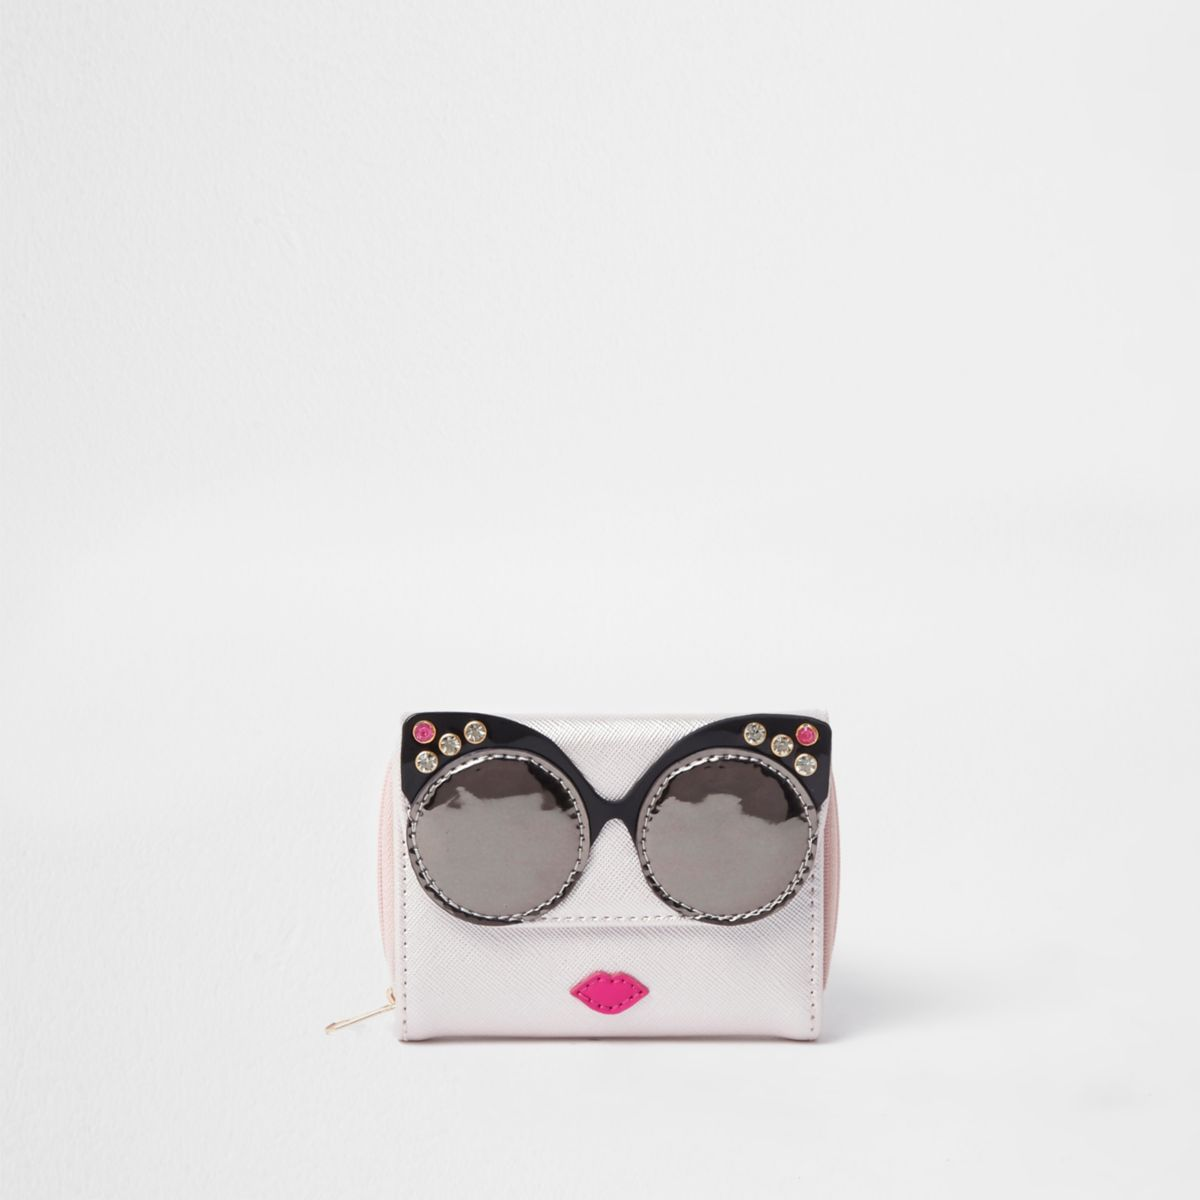 Girls pink metallic glasses purse